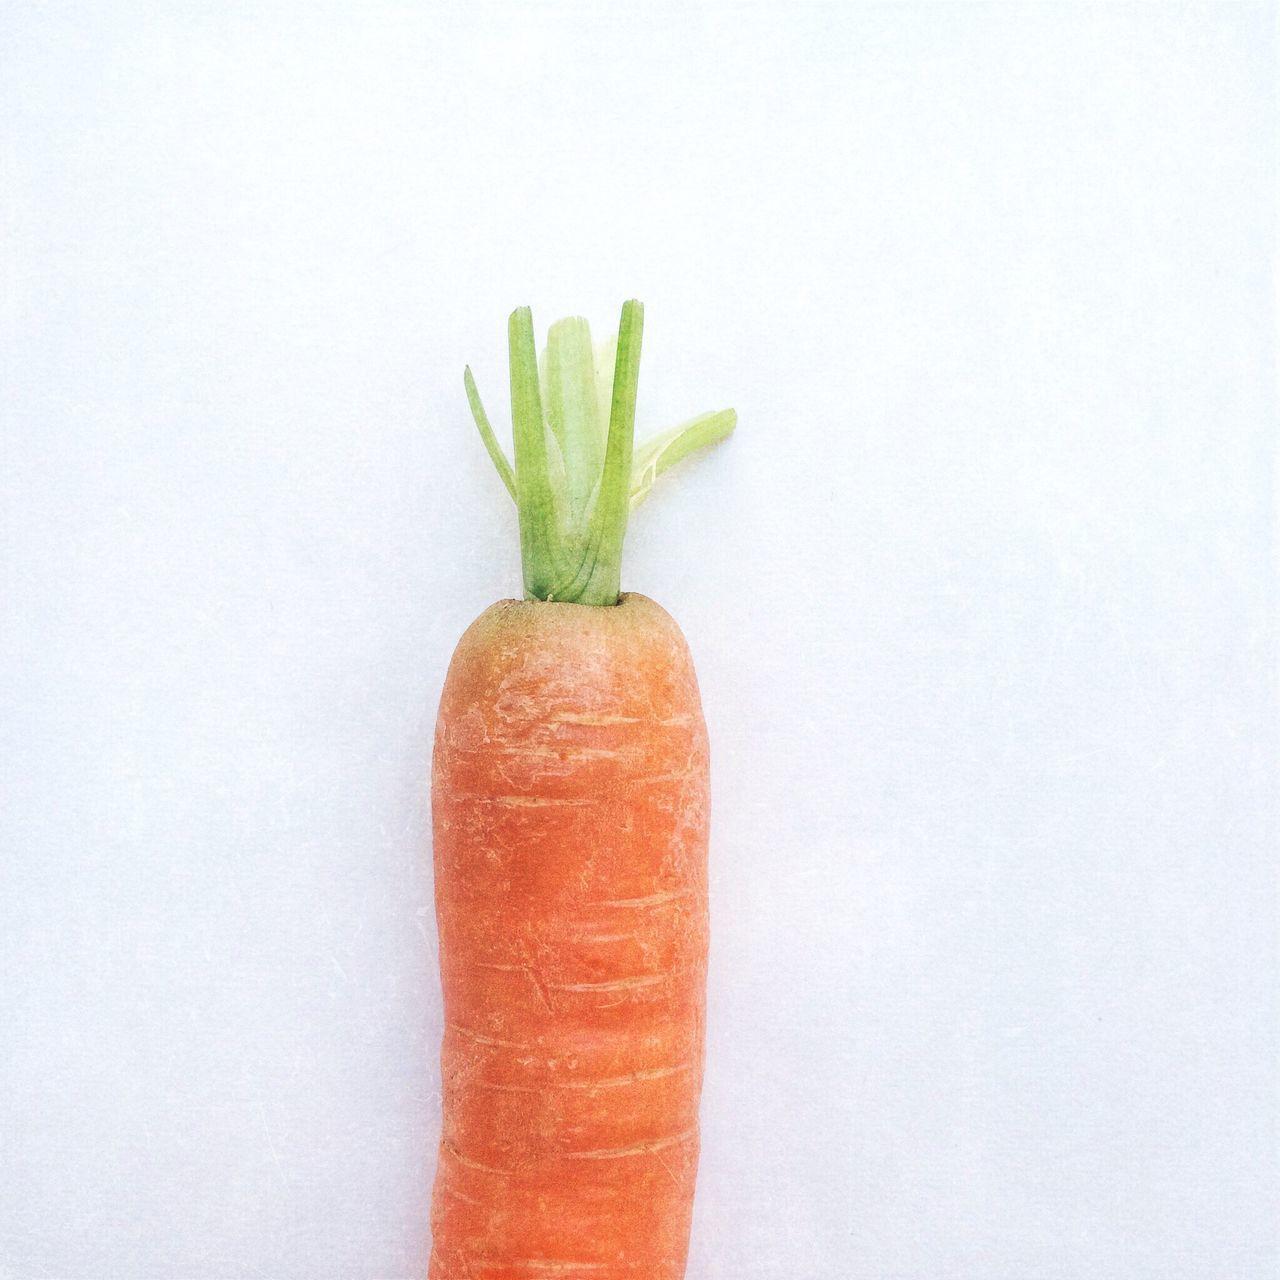 Carrot Carrot Orange Root Vegetable Colour Healthy Eating Vegetarian Diet